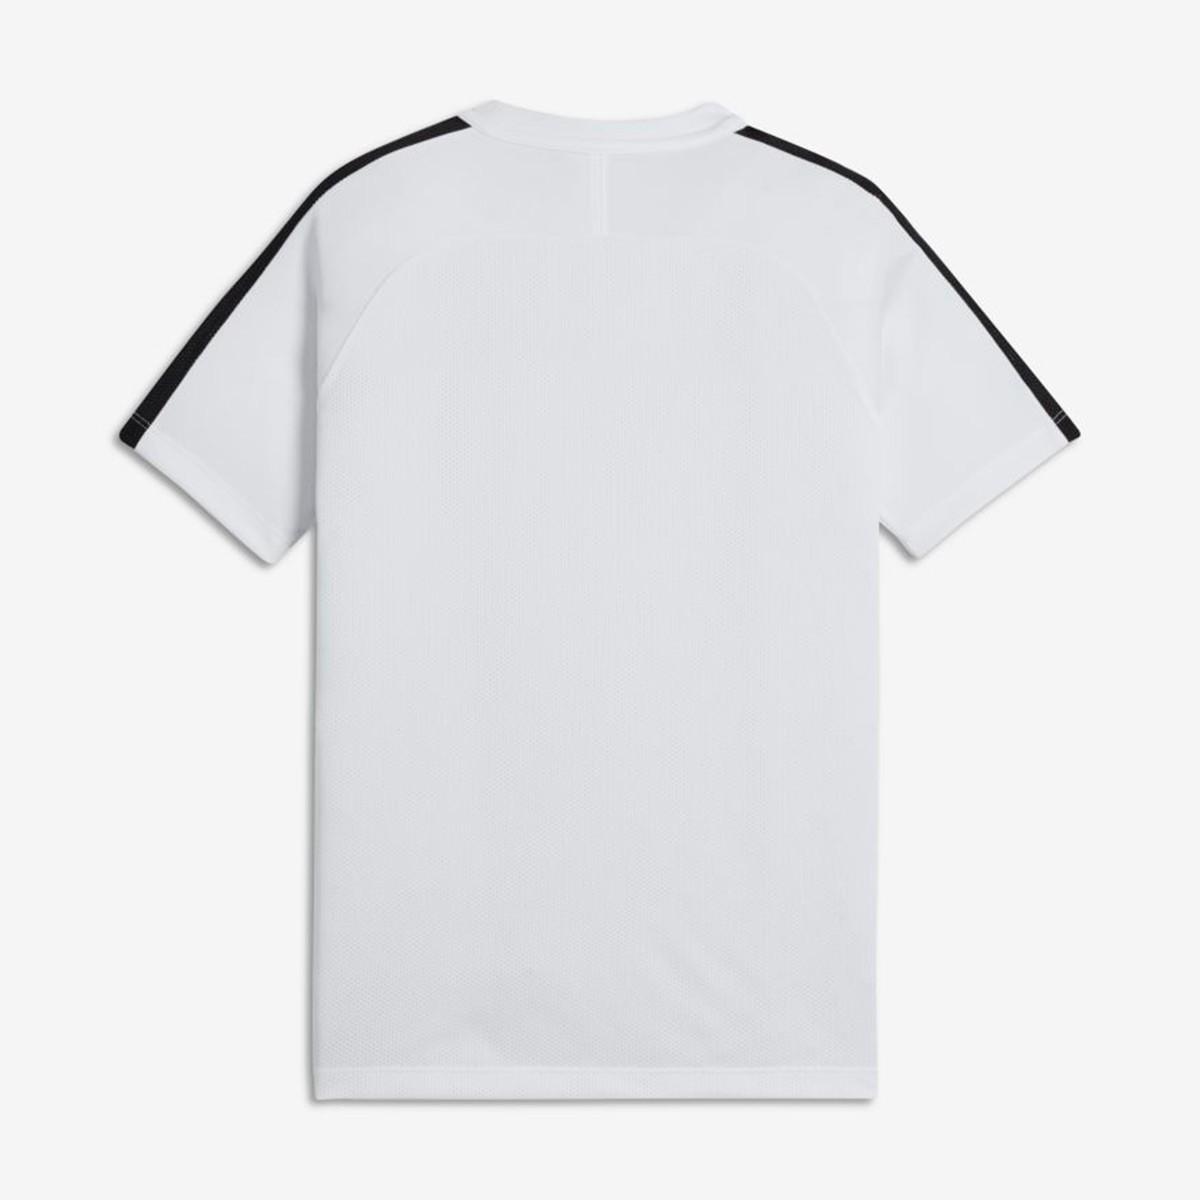 f7741a51a0 Jersey Nike Kids Dry Academy TopSS GX2 White-Black - Football store ...